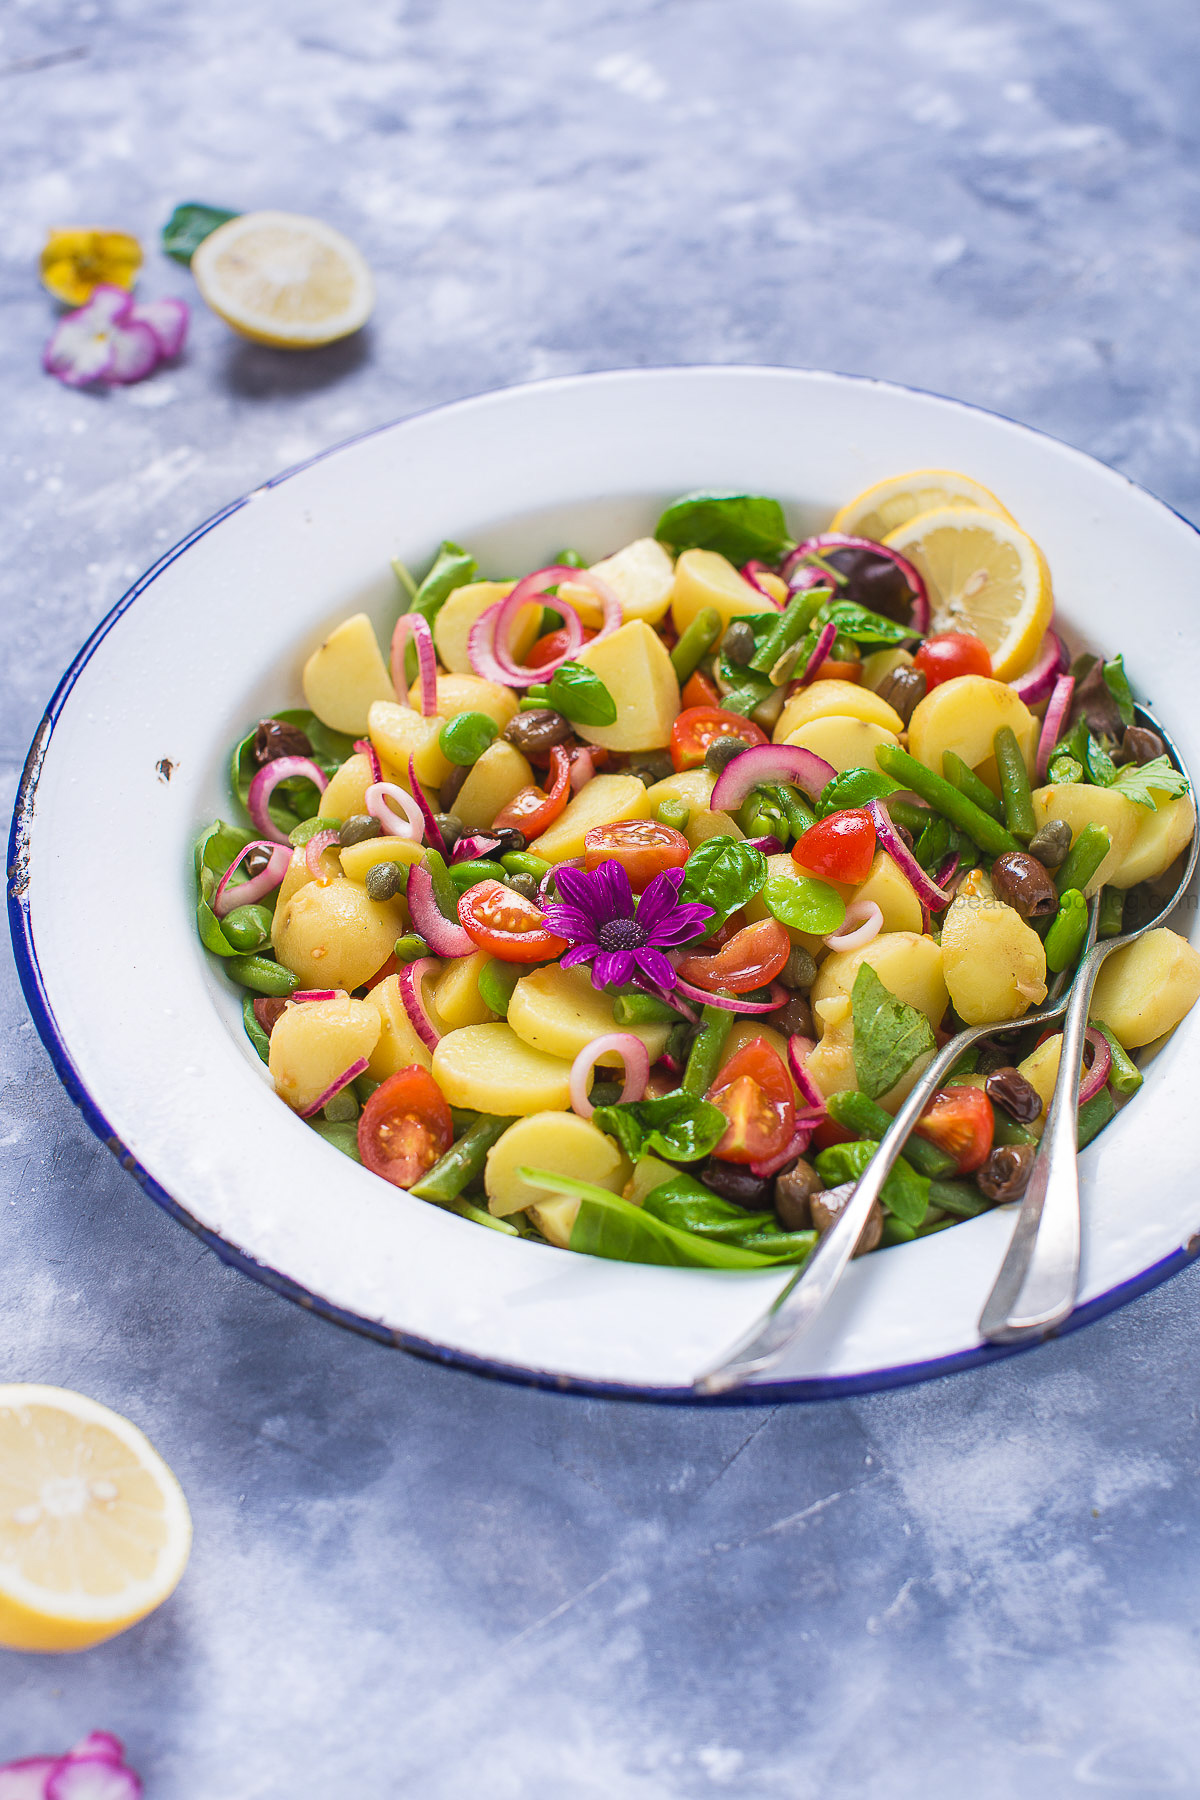 Italian spring fava bean and GREEN BEAN POTATO SALAD #VEGAN - insalata pantesca di patate con fagiolini e fave